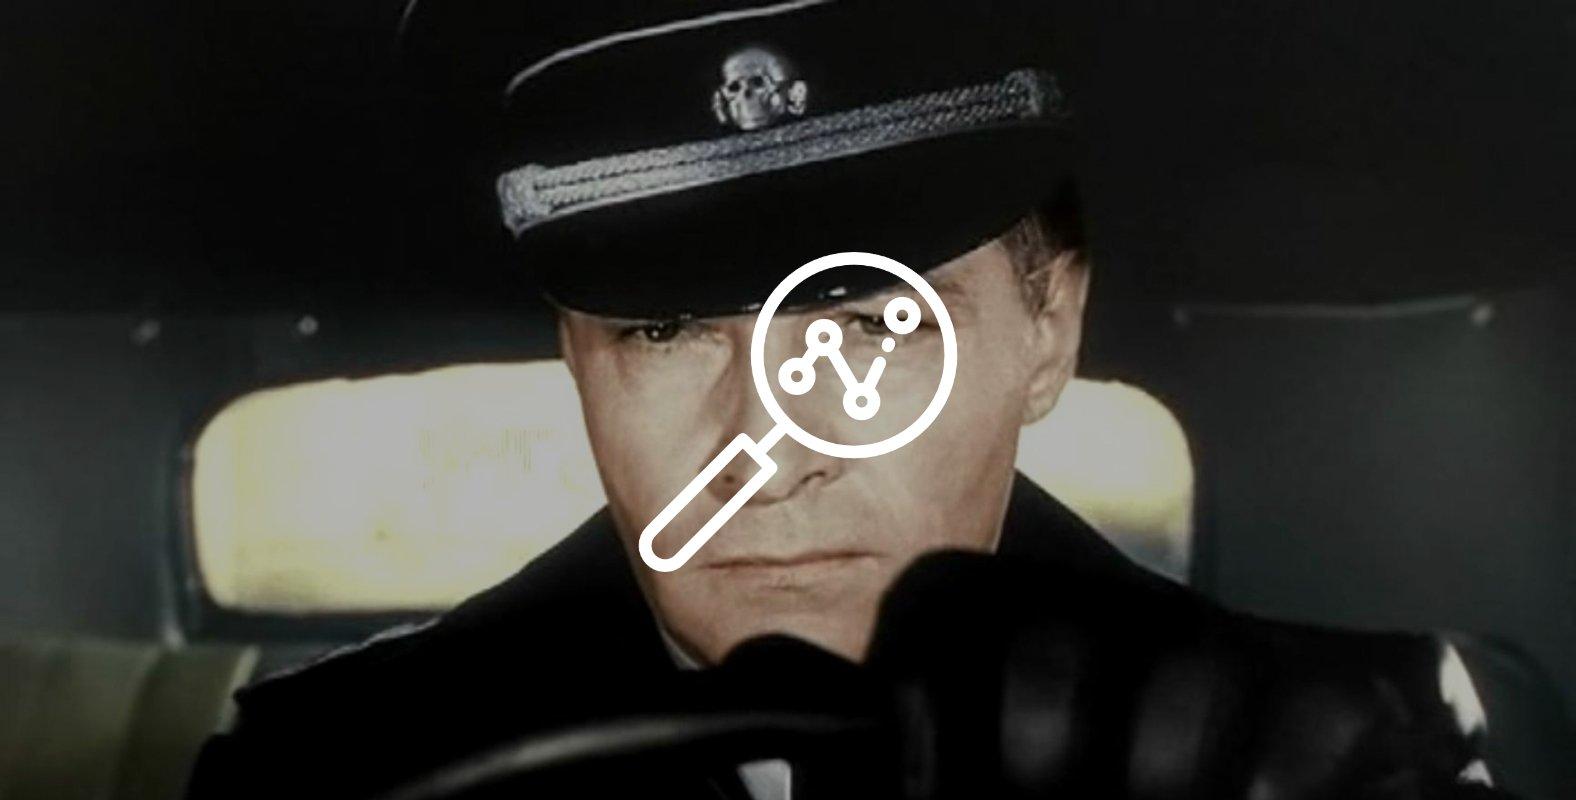 Шпионский сервис AdSpoiler